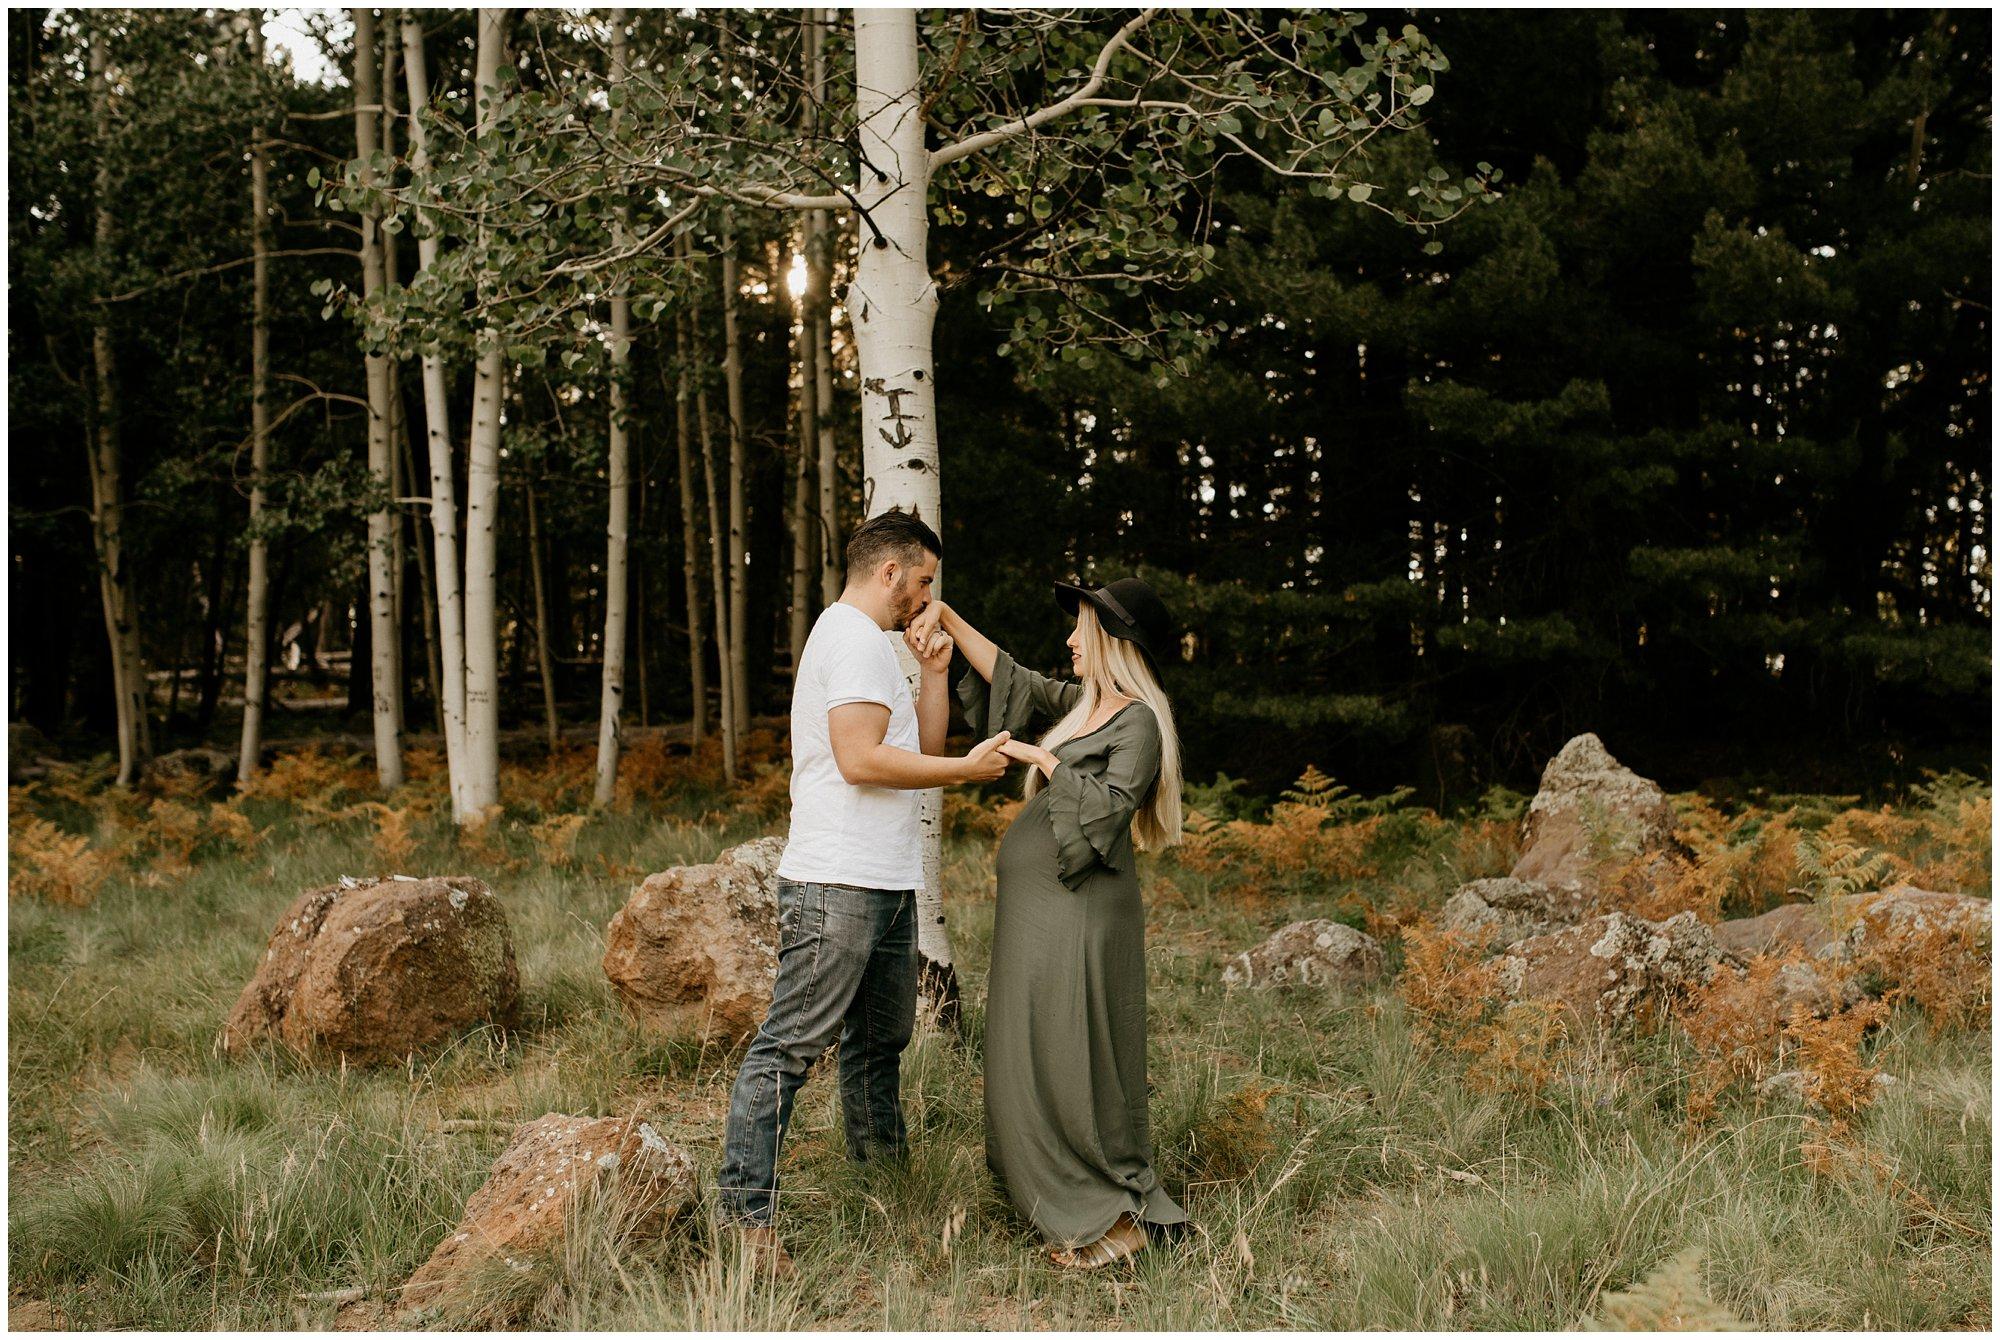 Flagstaff Aspen Tree Portrait Session - Gabby + Gary - Ashtyn Nicole Photo_0020.jpg